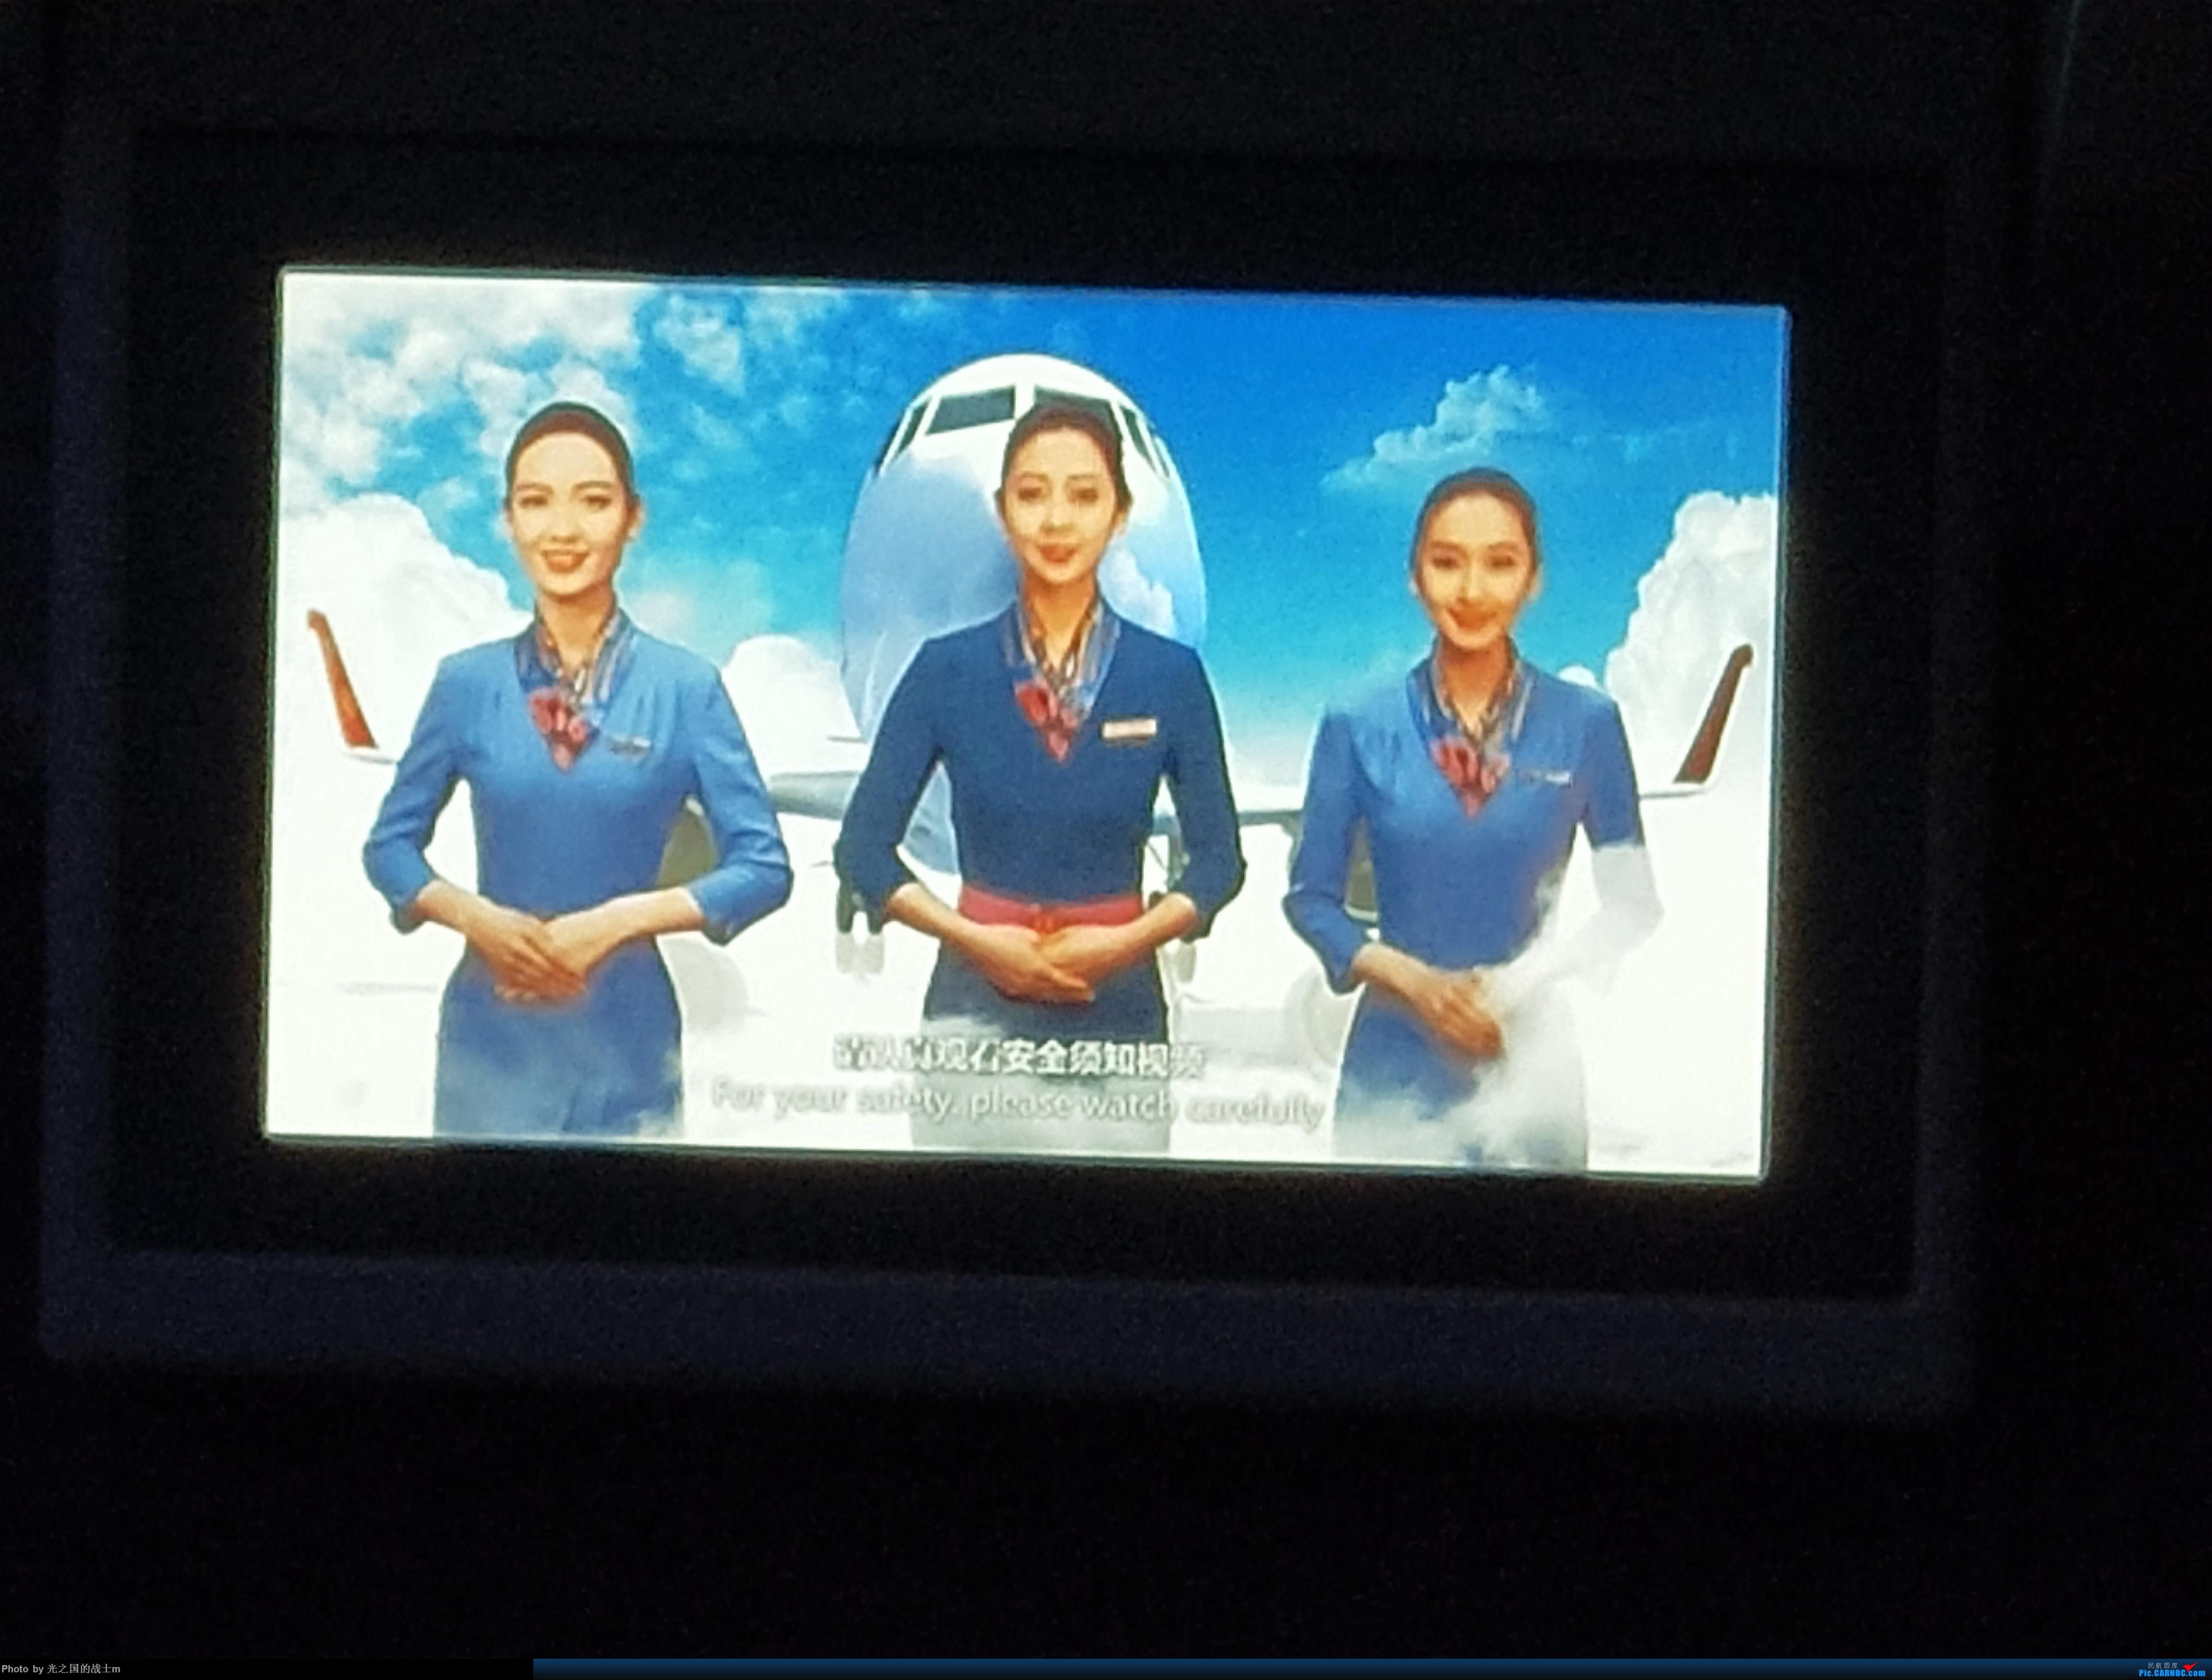 Re:[原创]【光之国m游记】由春城飞往极边之城腾冲,体验不一样的短途航线 BOEING 737-700